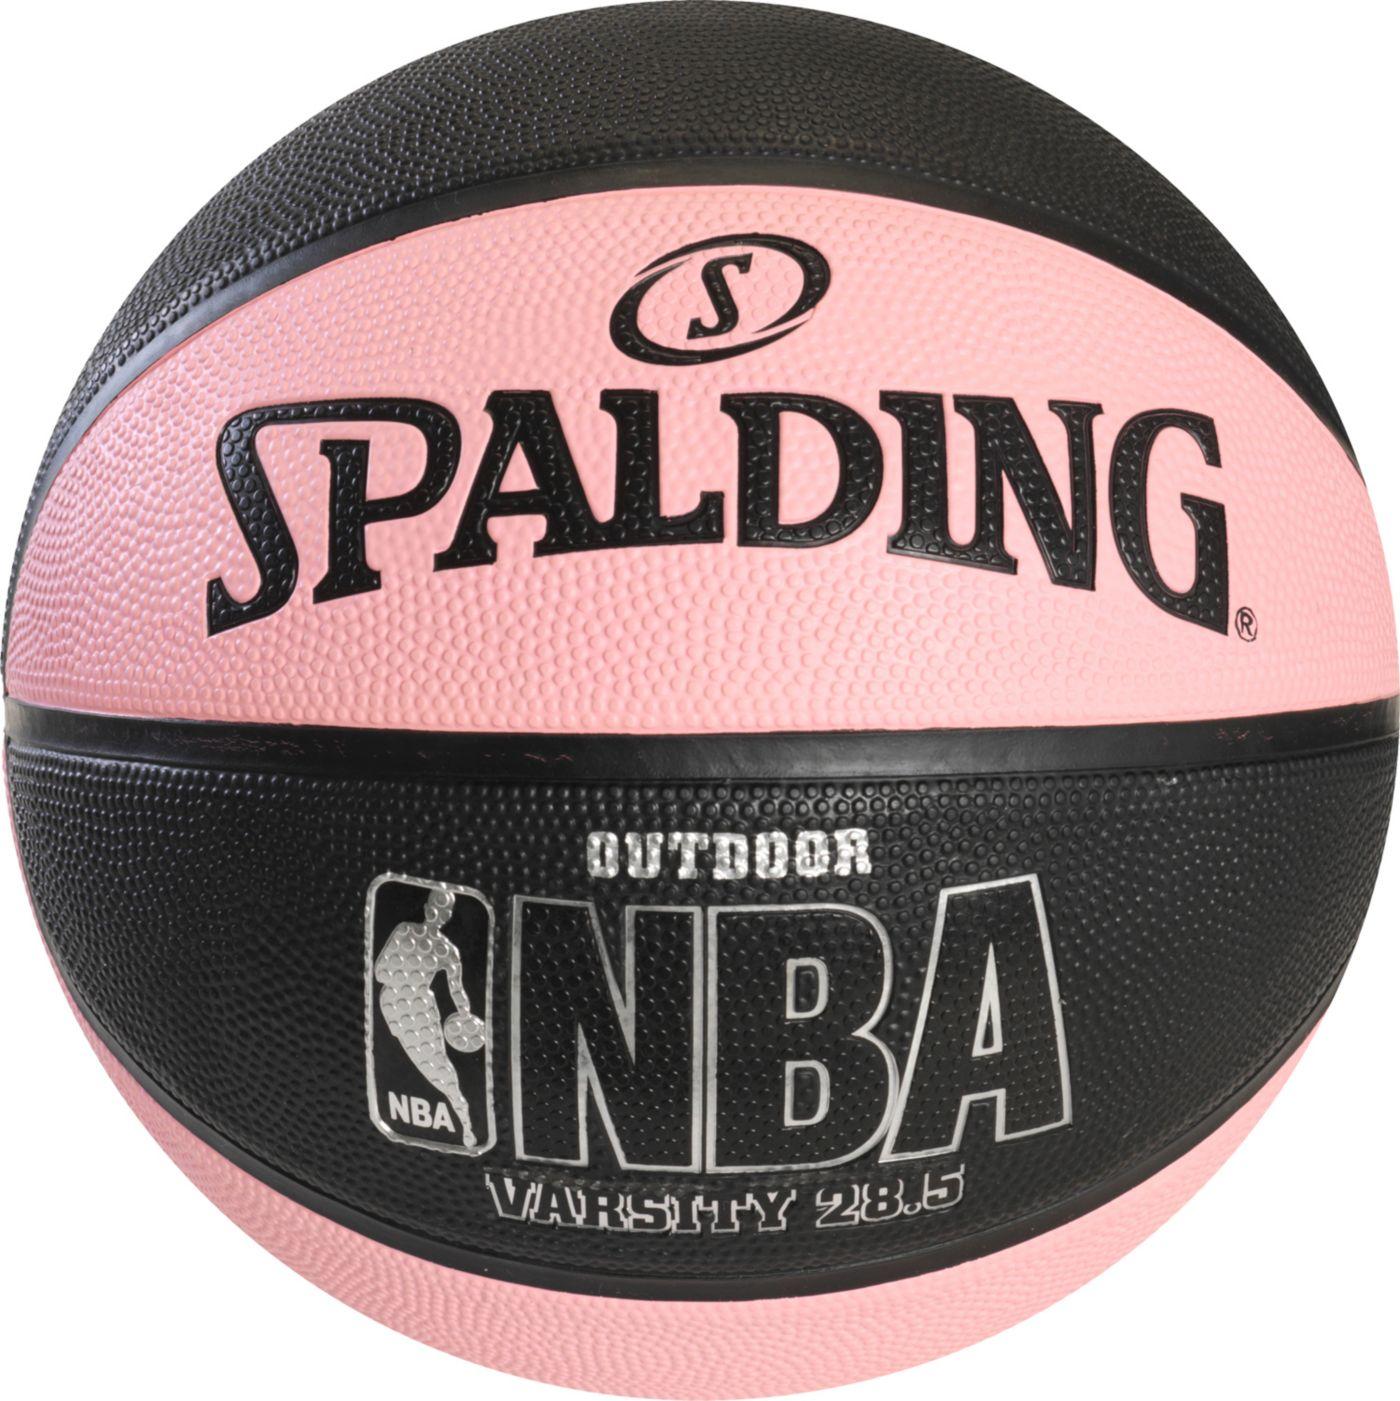 "Spalding NBA Varsity Basketball (28.5"")"